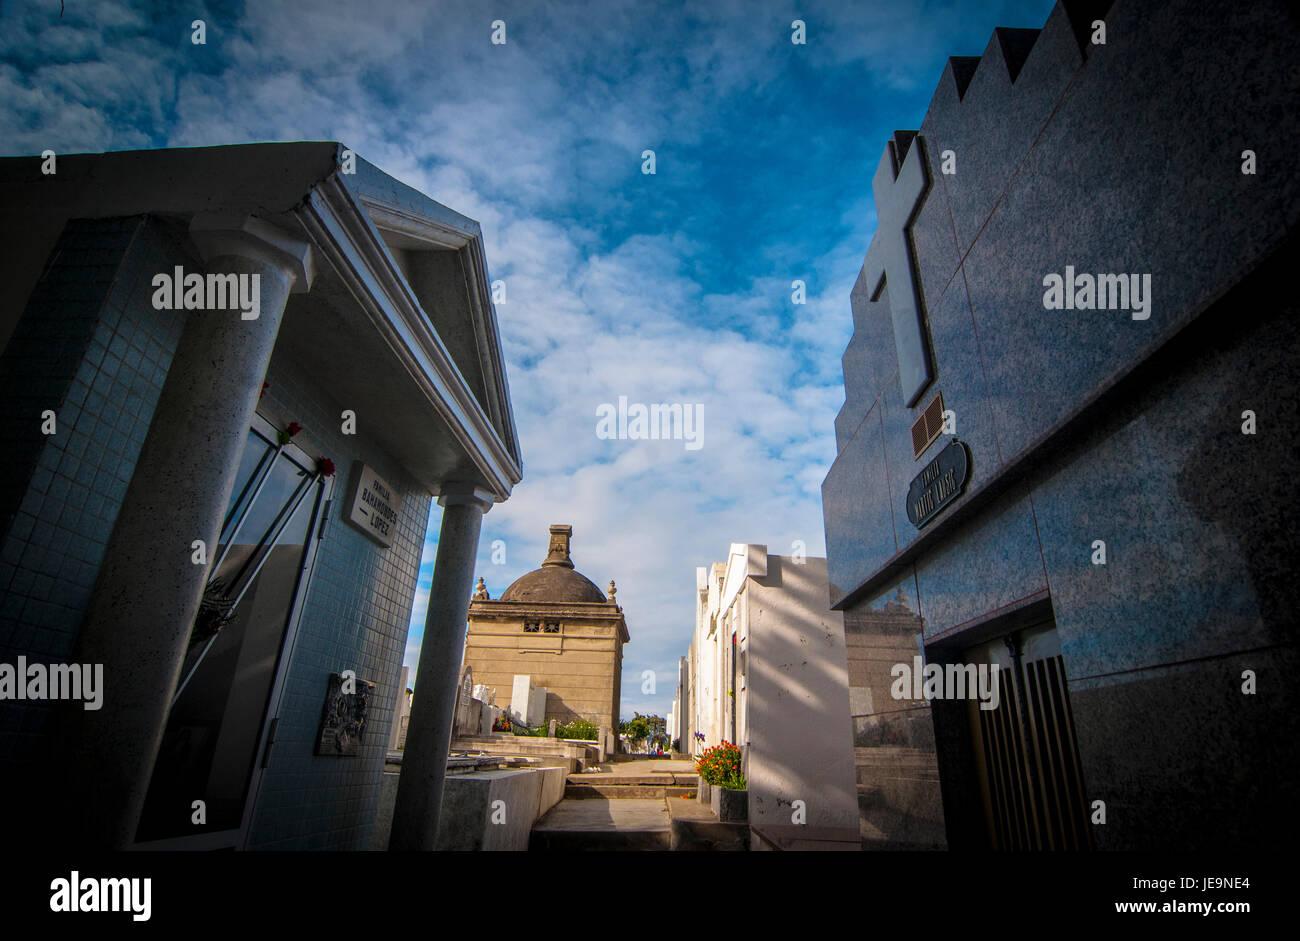 Cementerio de Punta Arenas / cimitero Foto Stock